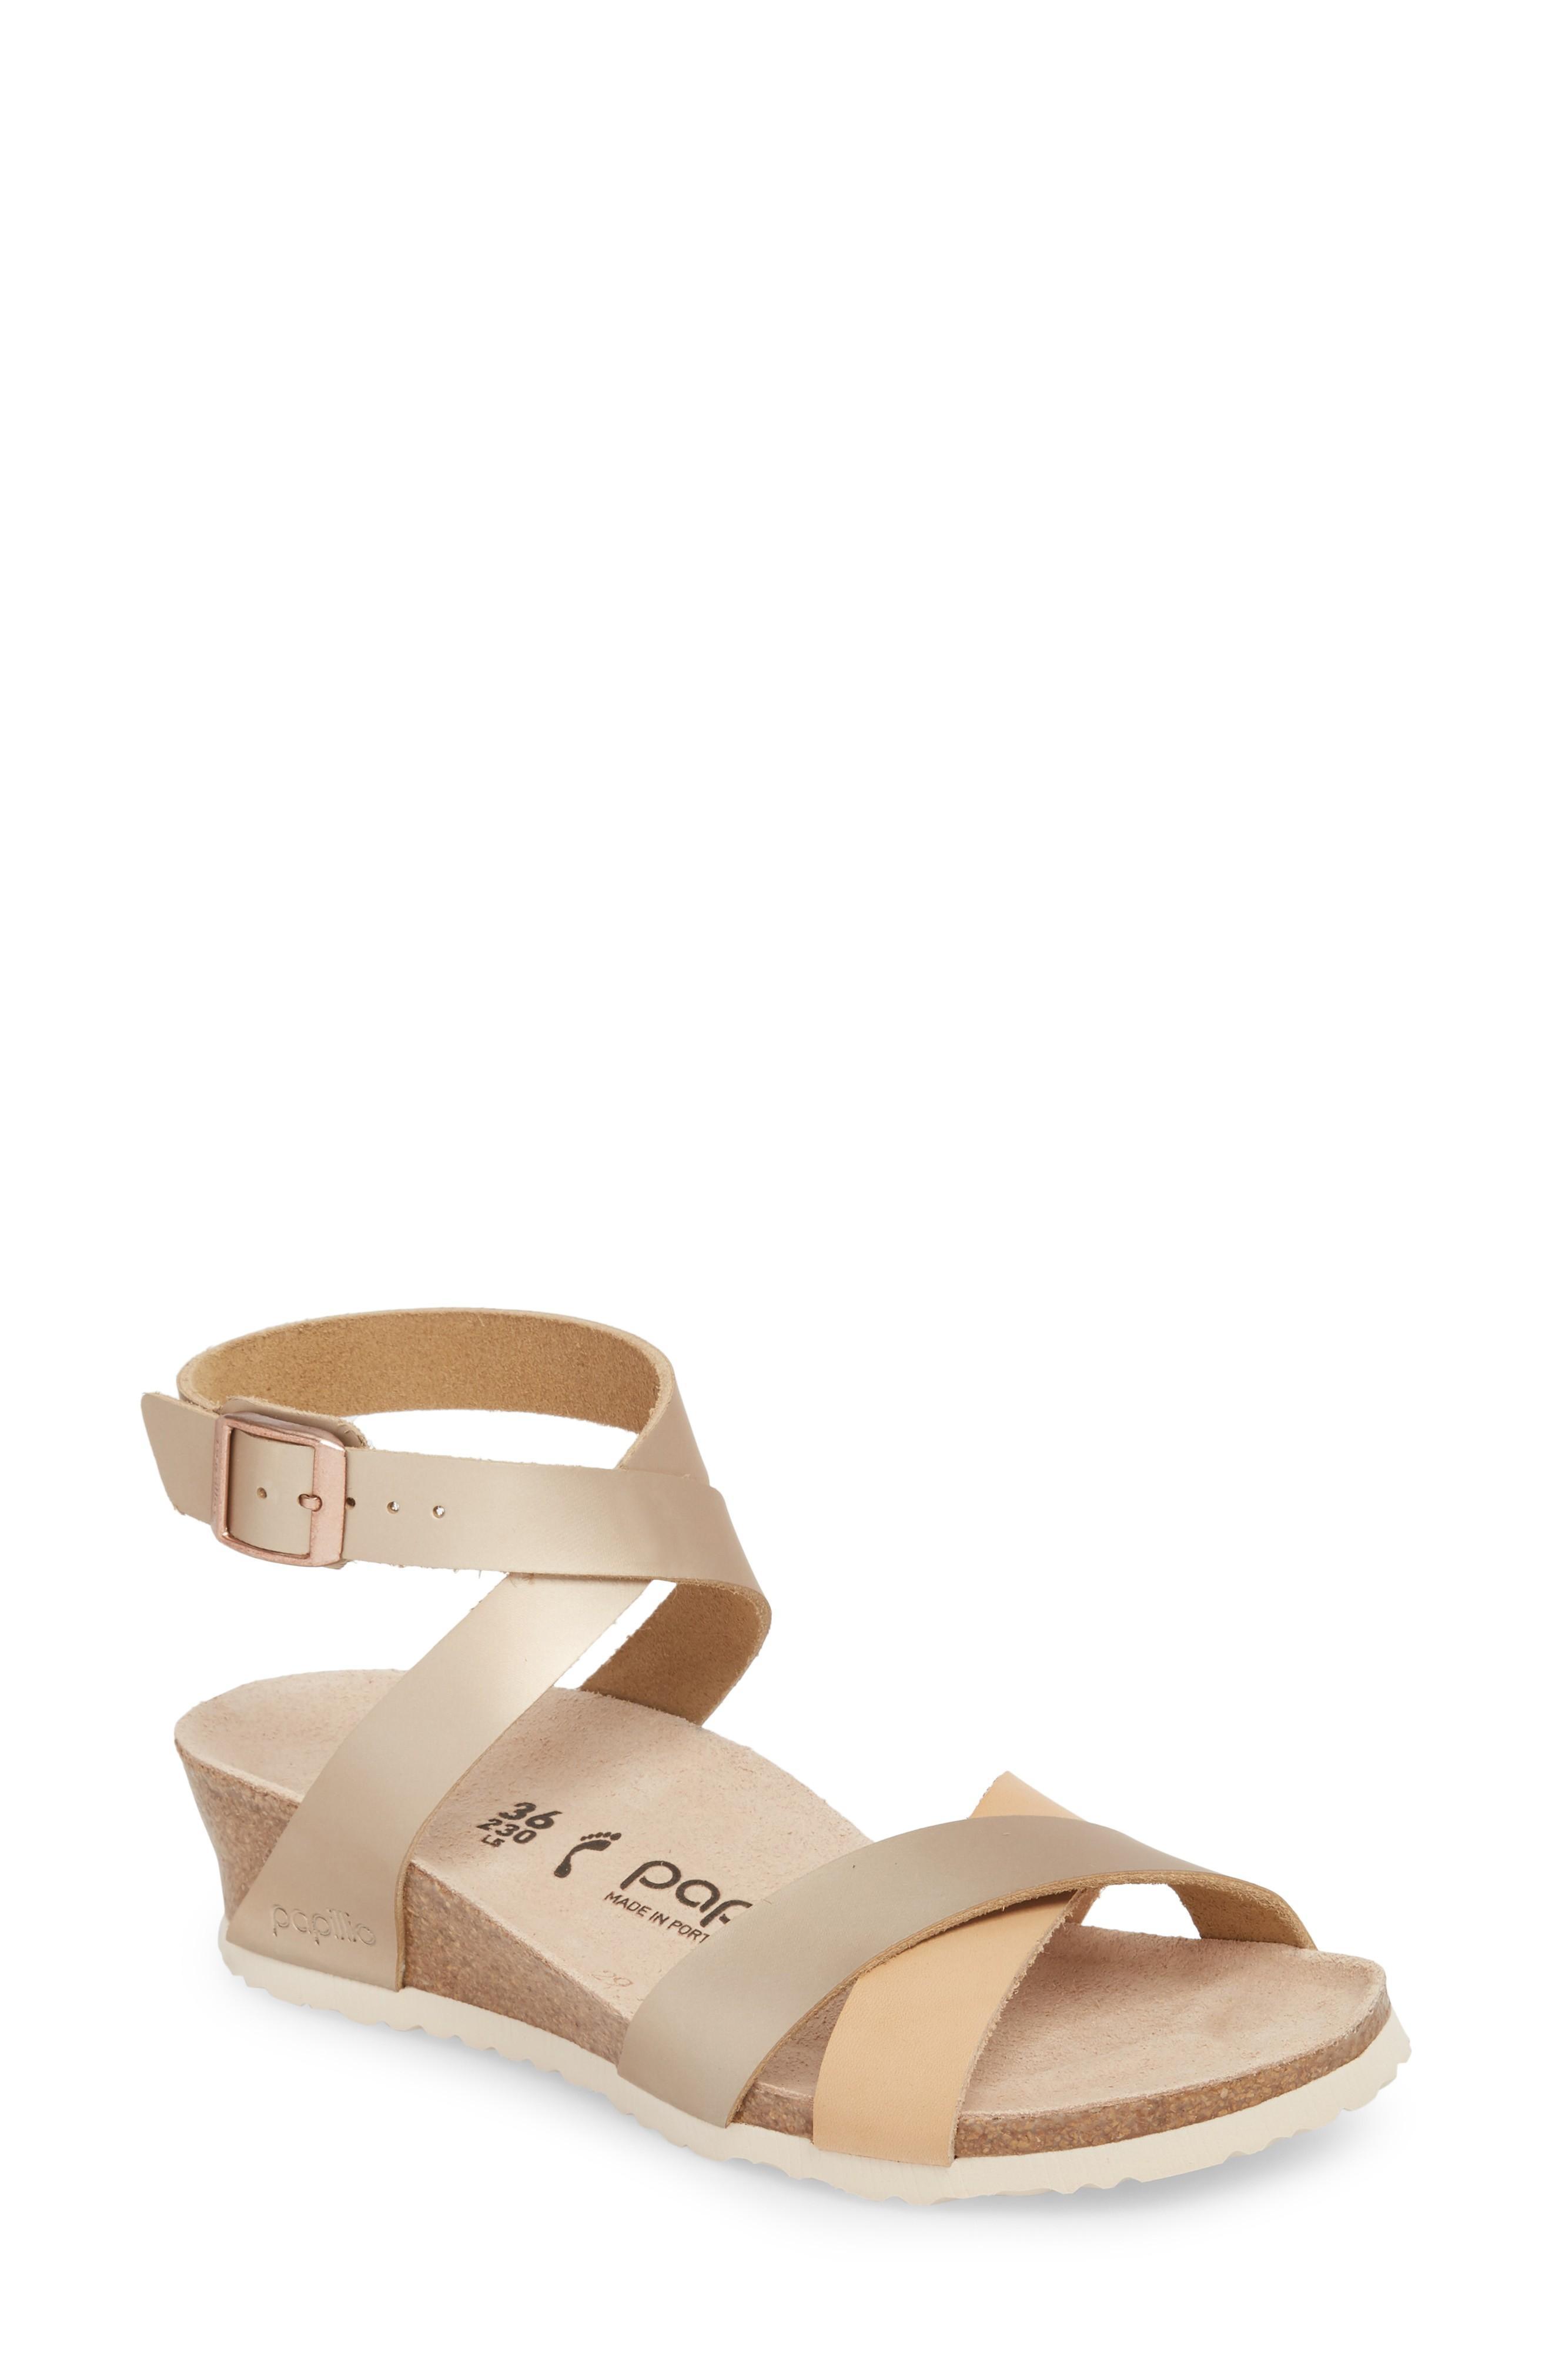 cf52df3128 Birkenstock Lola Wedge Sandal In Frosted Metallic Rose | ModeSens